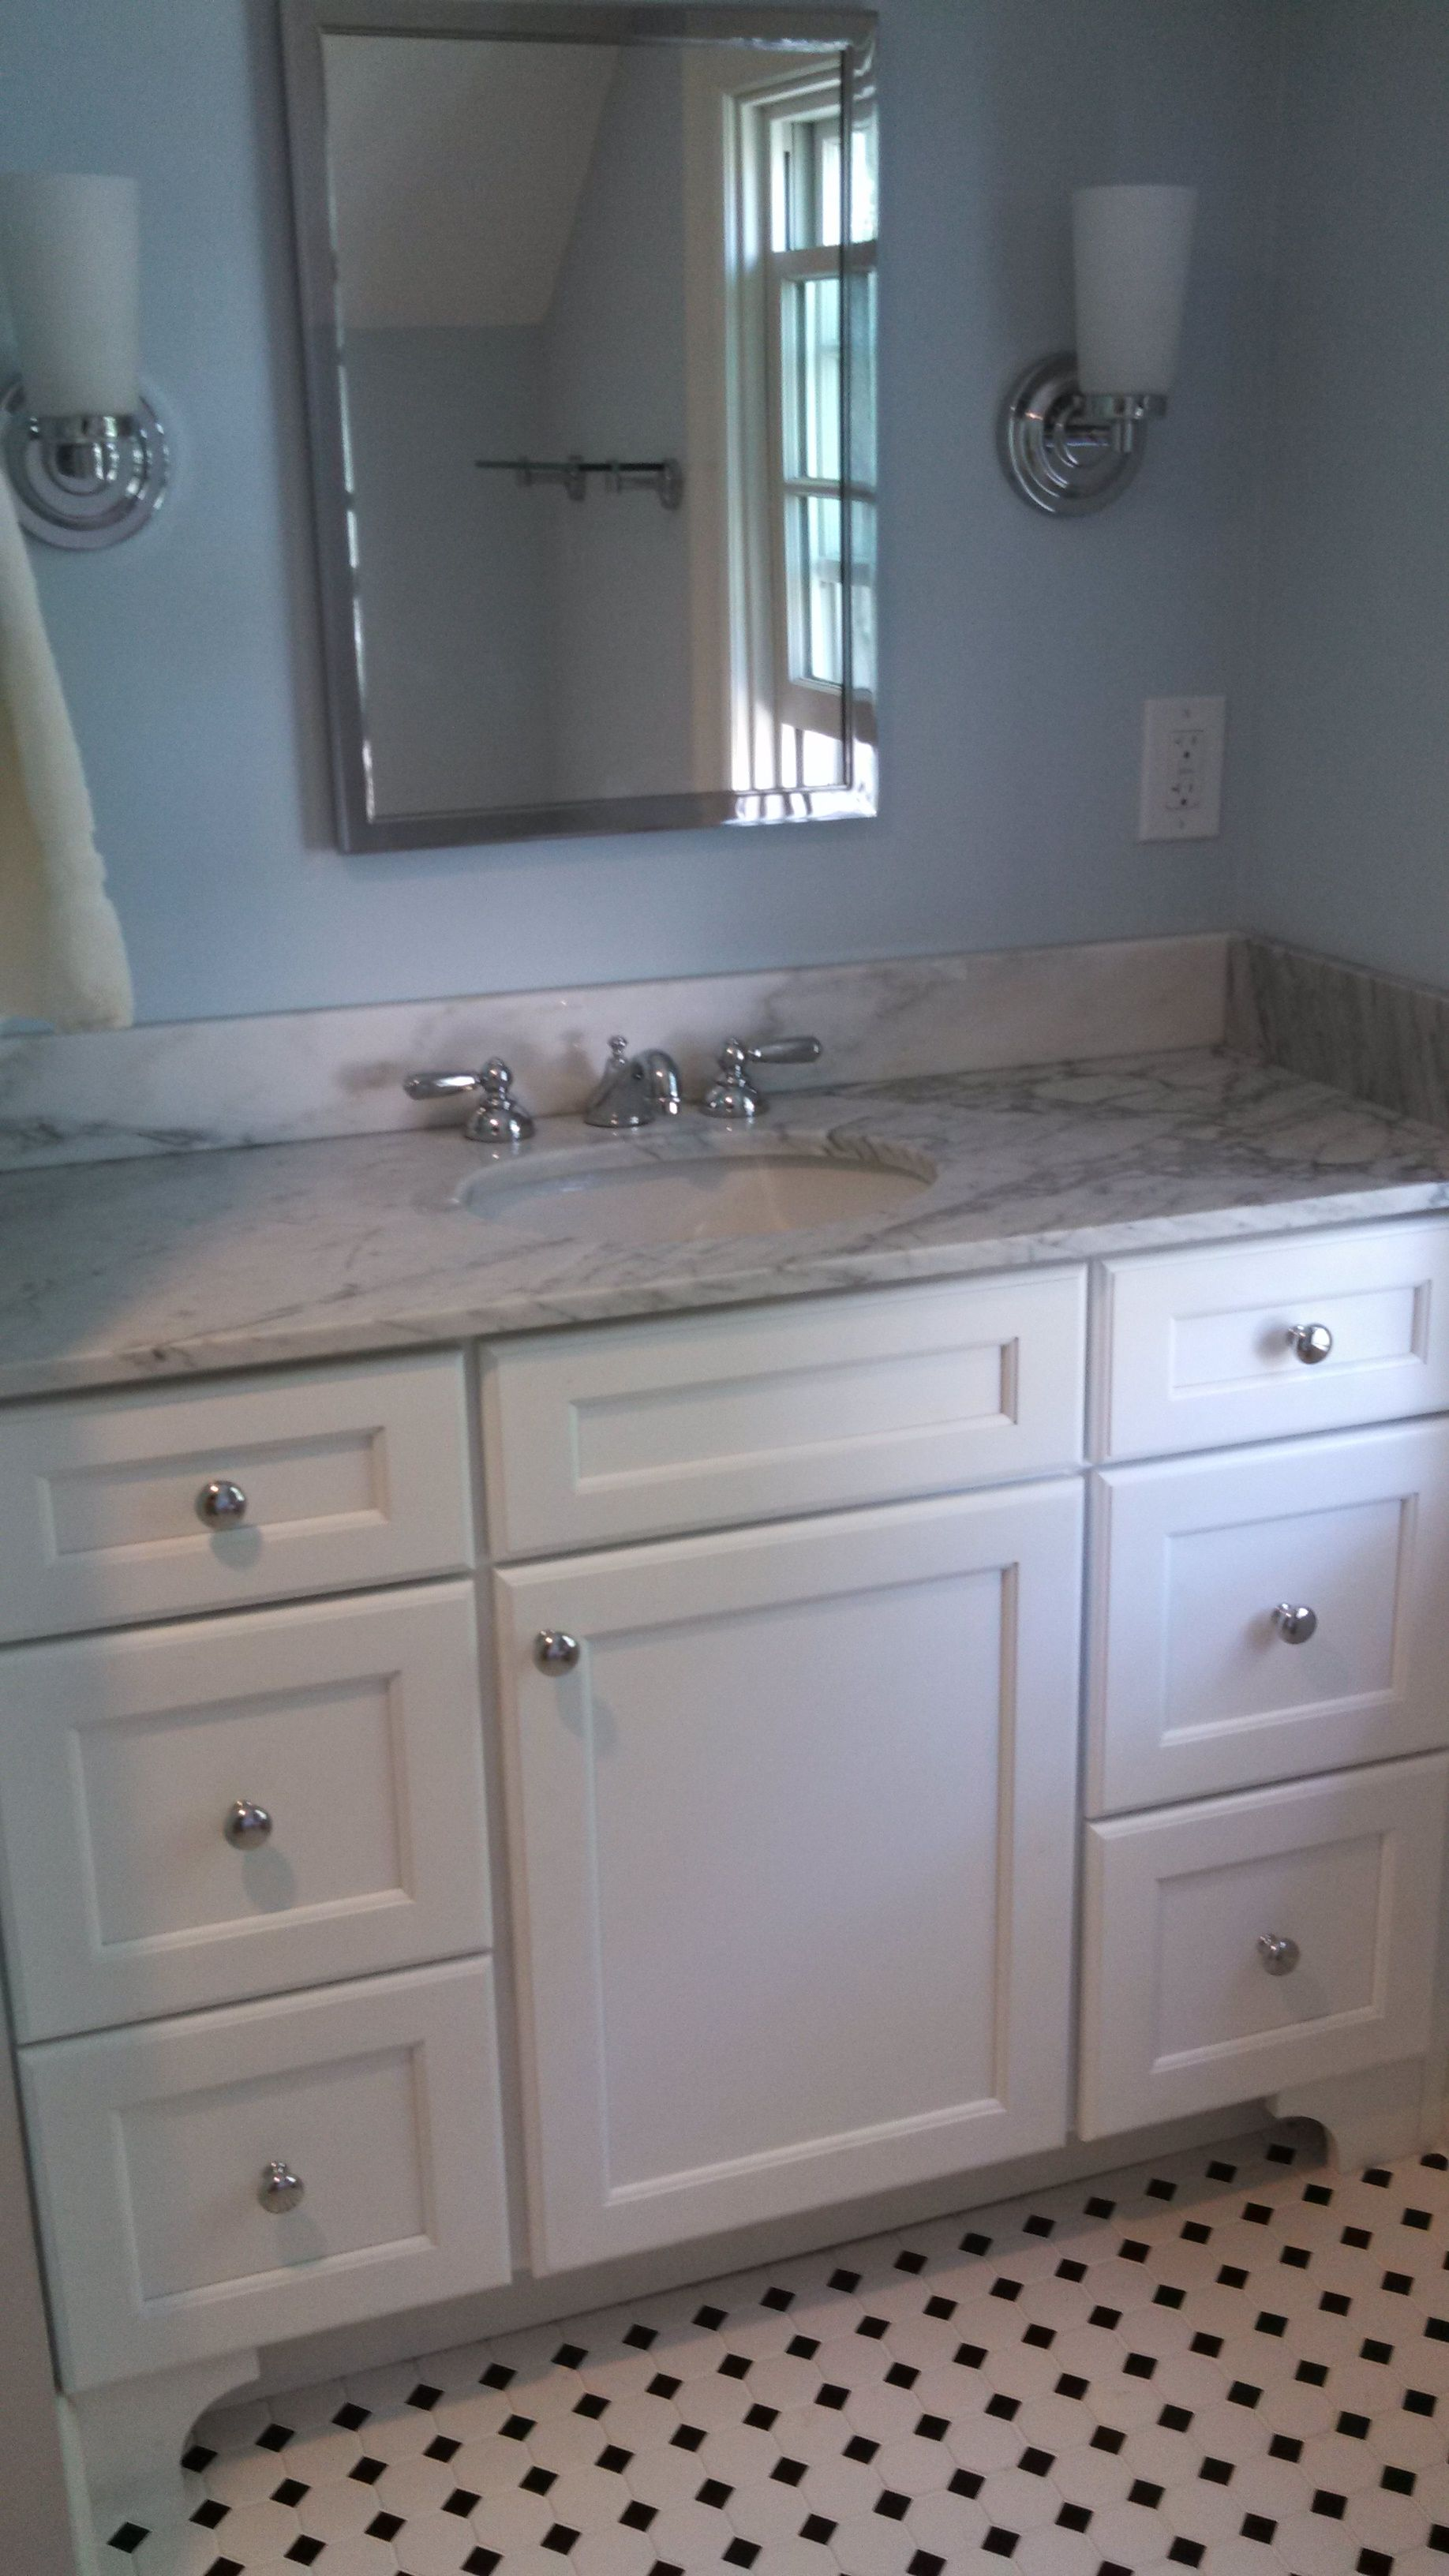 White Vanity Carrara Marble Countertop Porcelain Flooring In